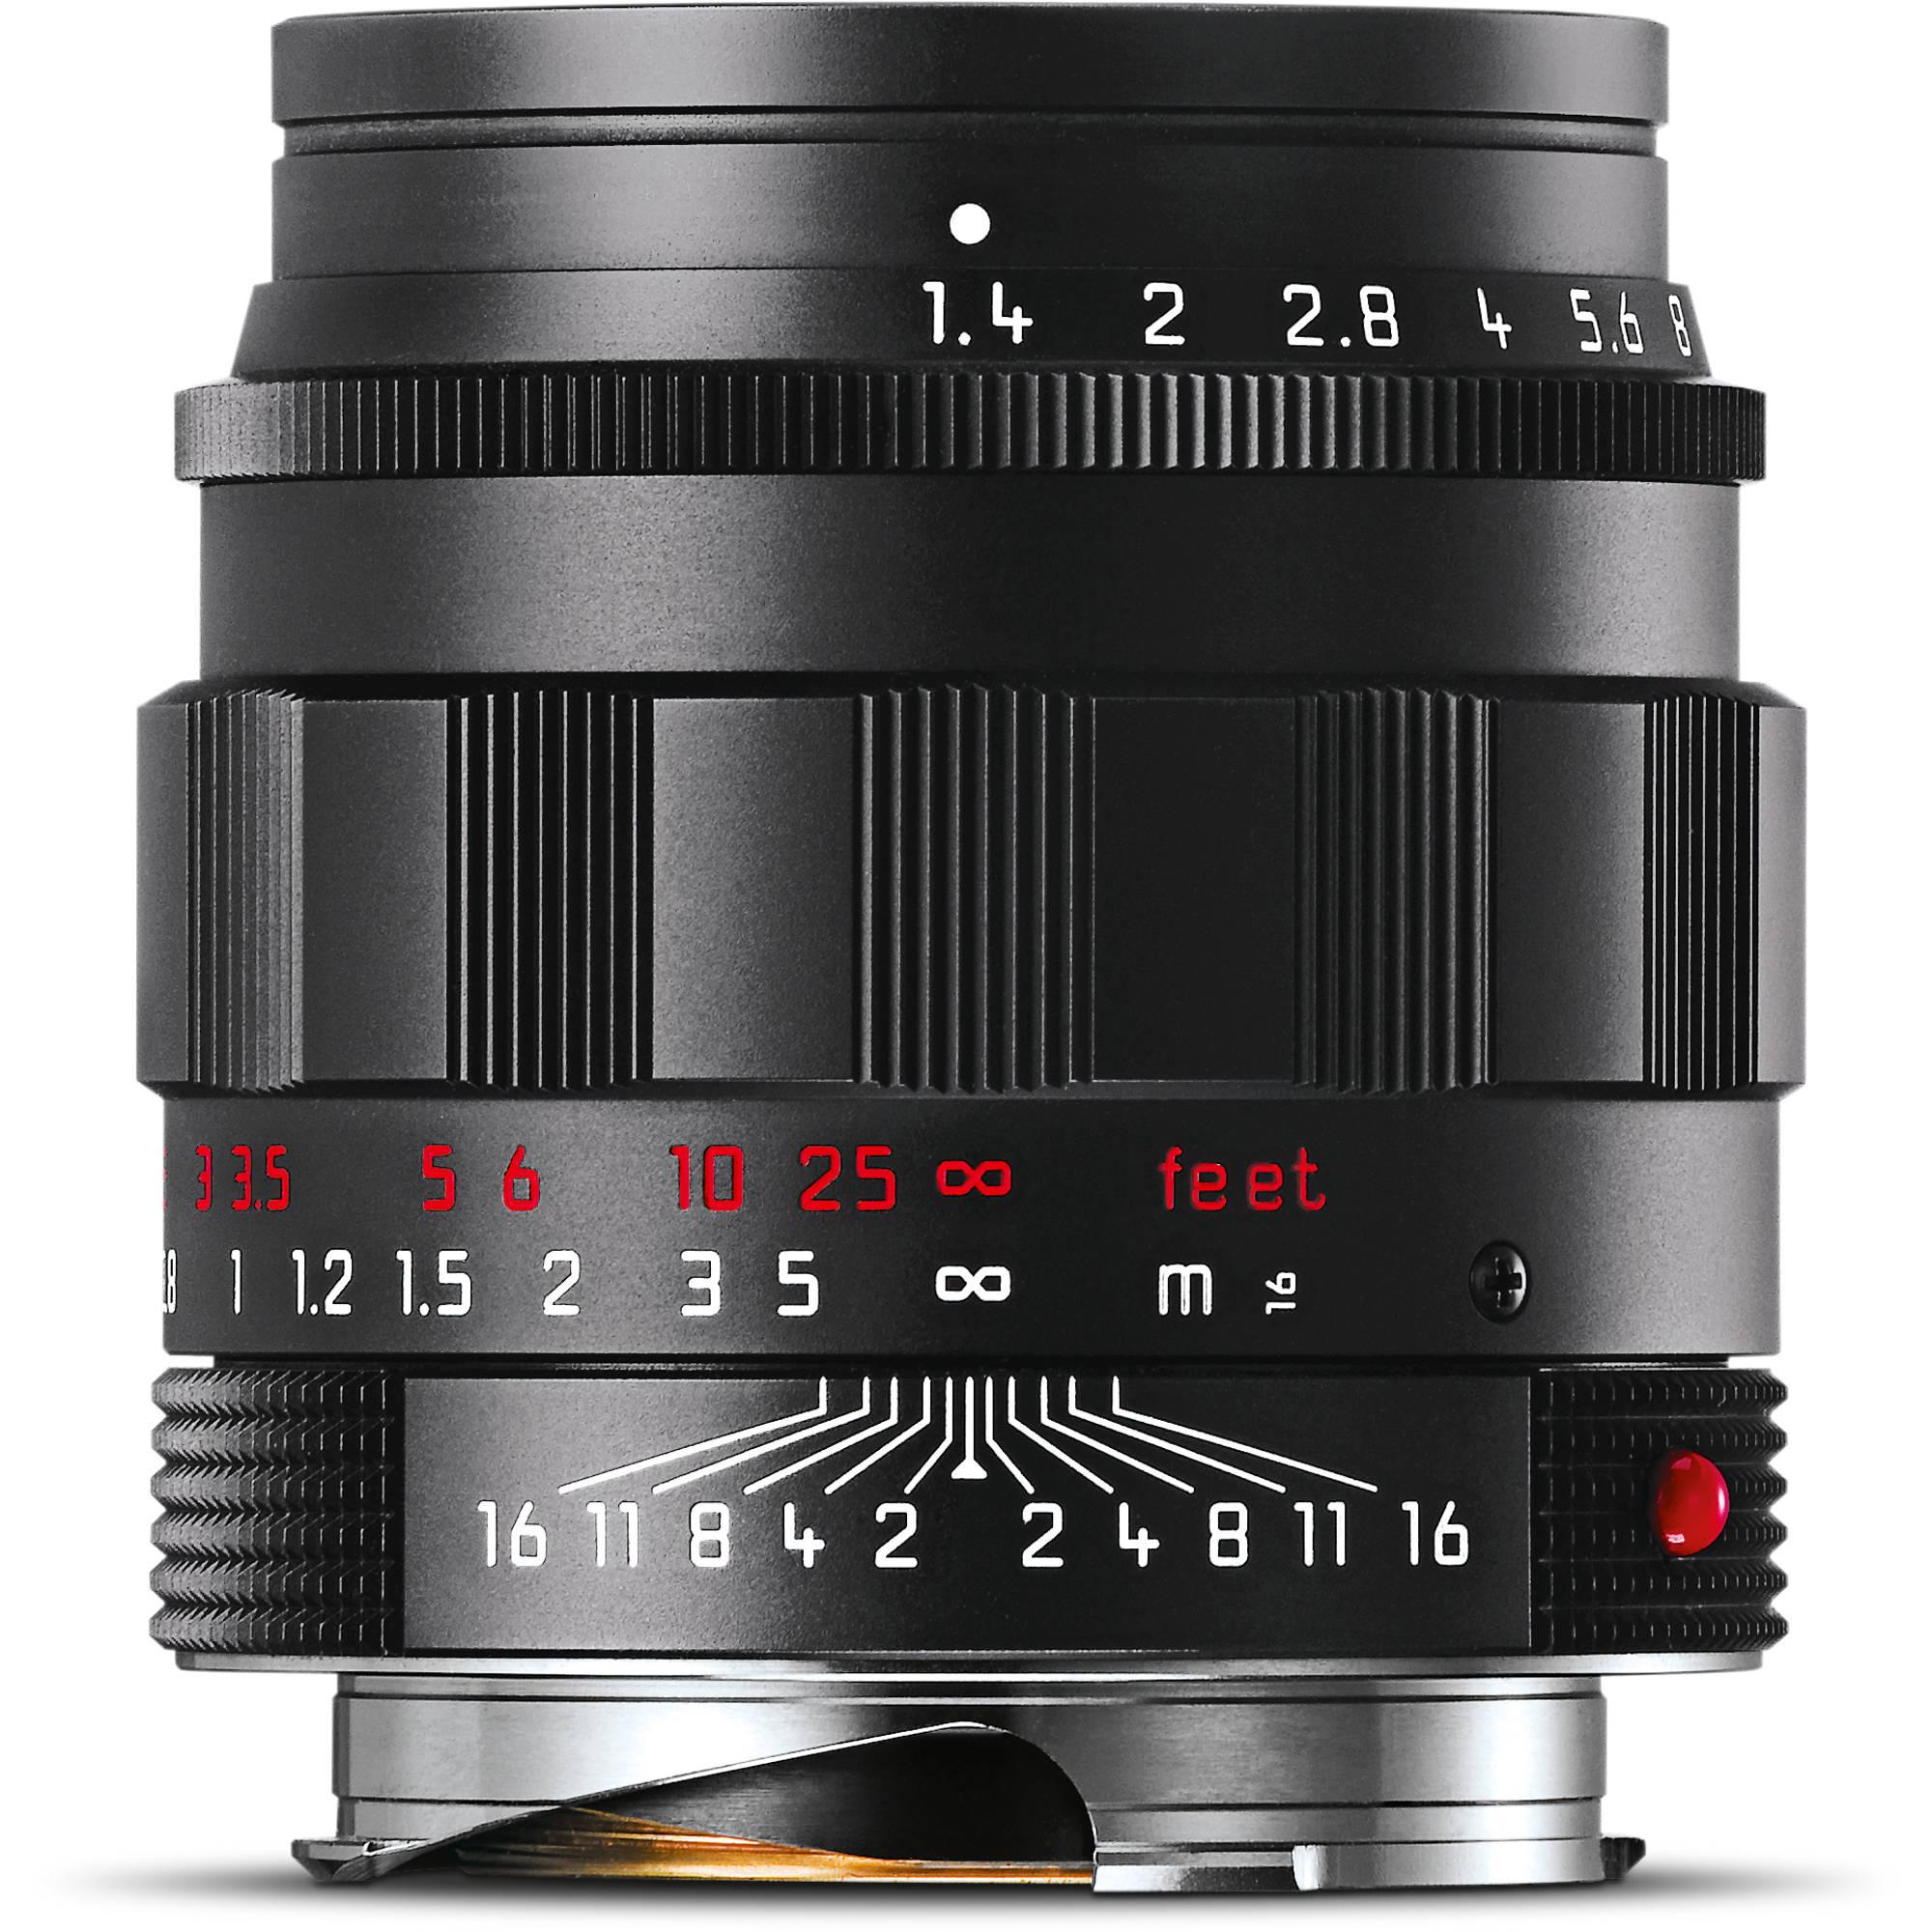 Leica Summilux-M 50mm f/1 4 ASPH  Lens (Black-Chrome Edition)